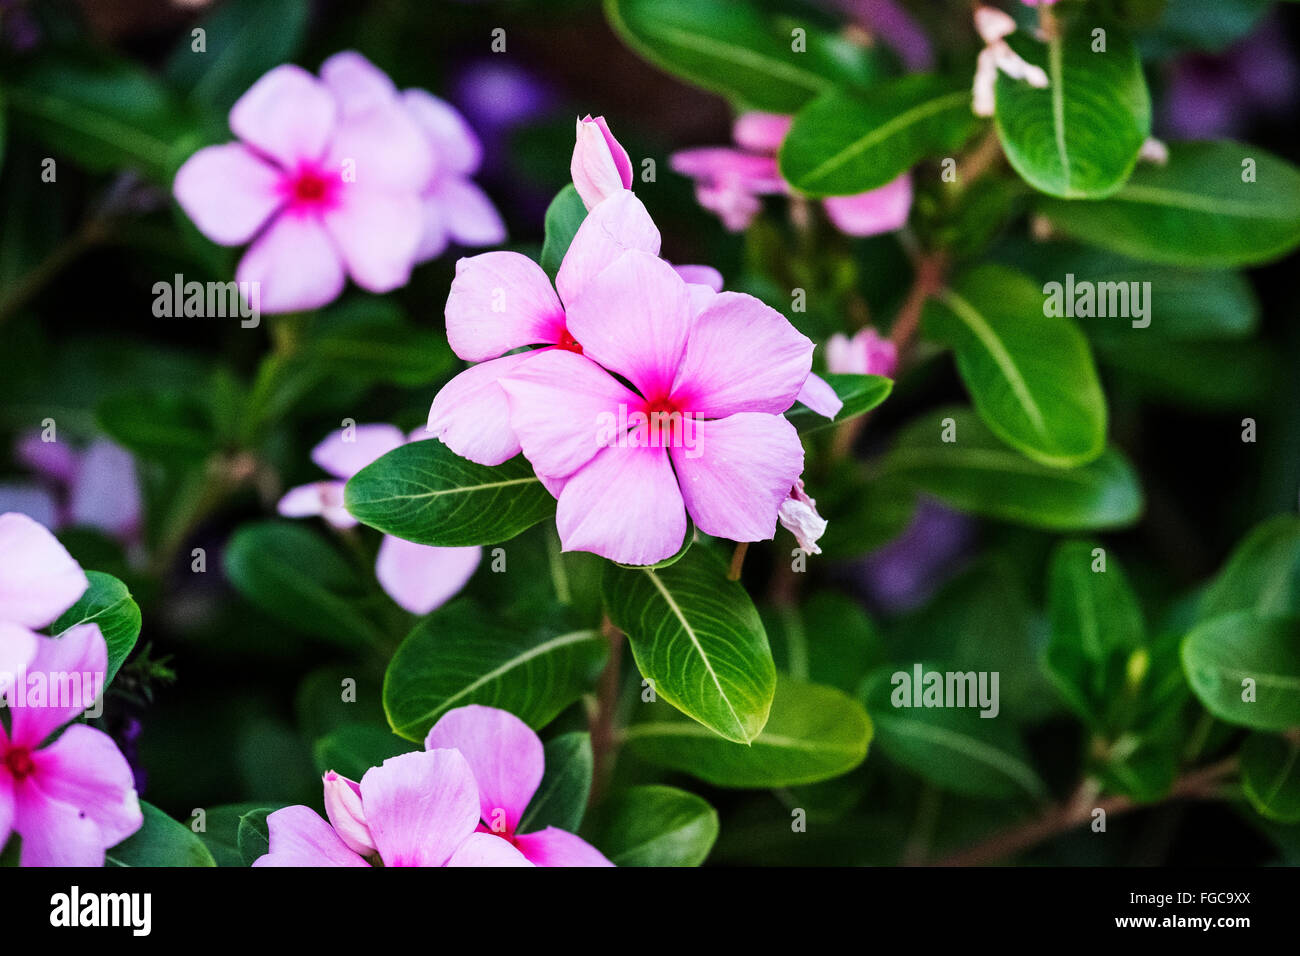 Pink Vinca Flower Stock Photos Pink Vinca Flower Stock Images Alamy